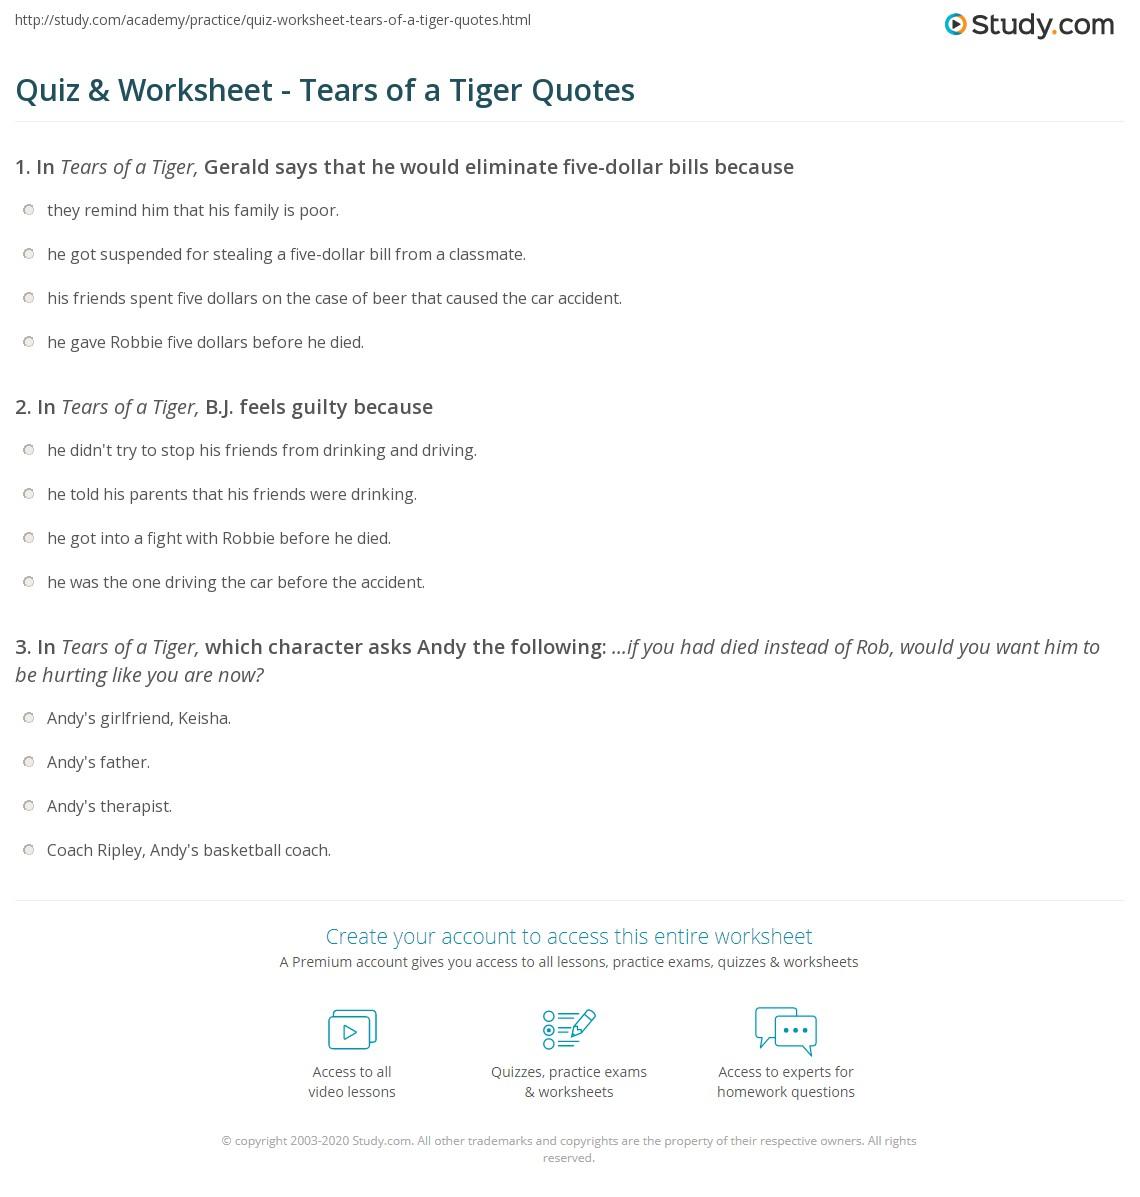 quiz worksheet tears of a tiger quotes. Black Bedroom Furniture Sets. Home Design Ideas